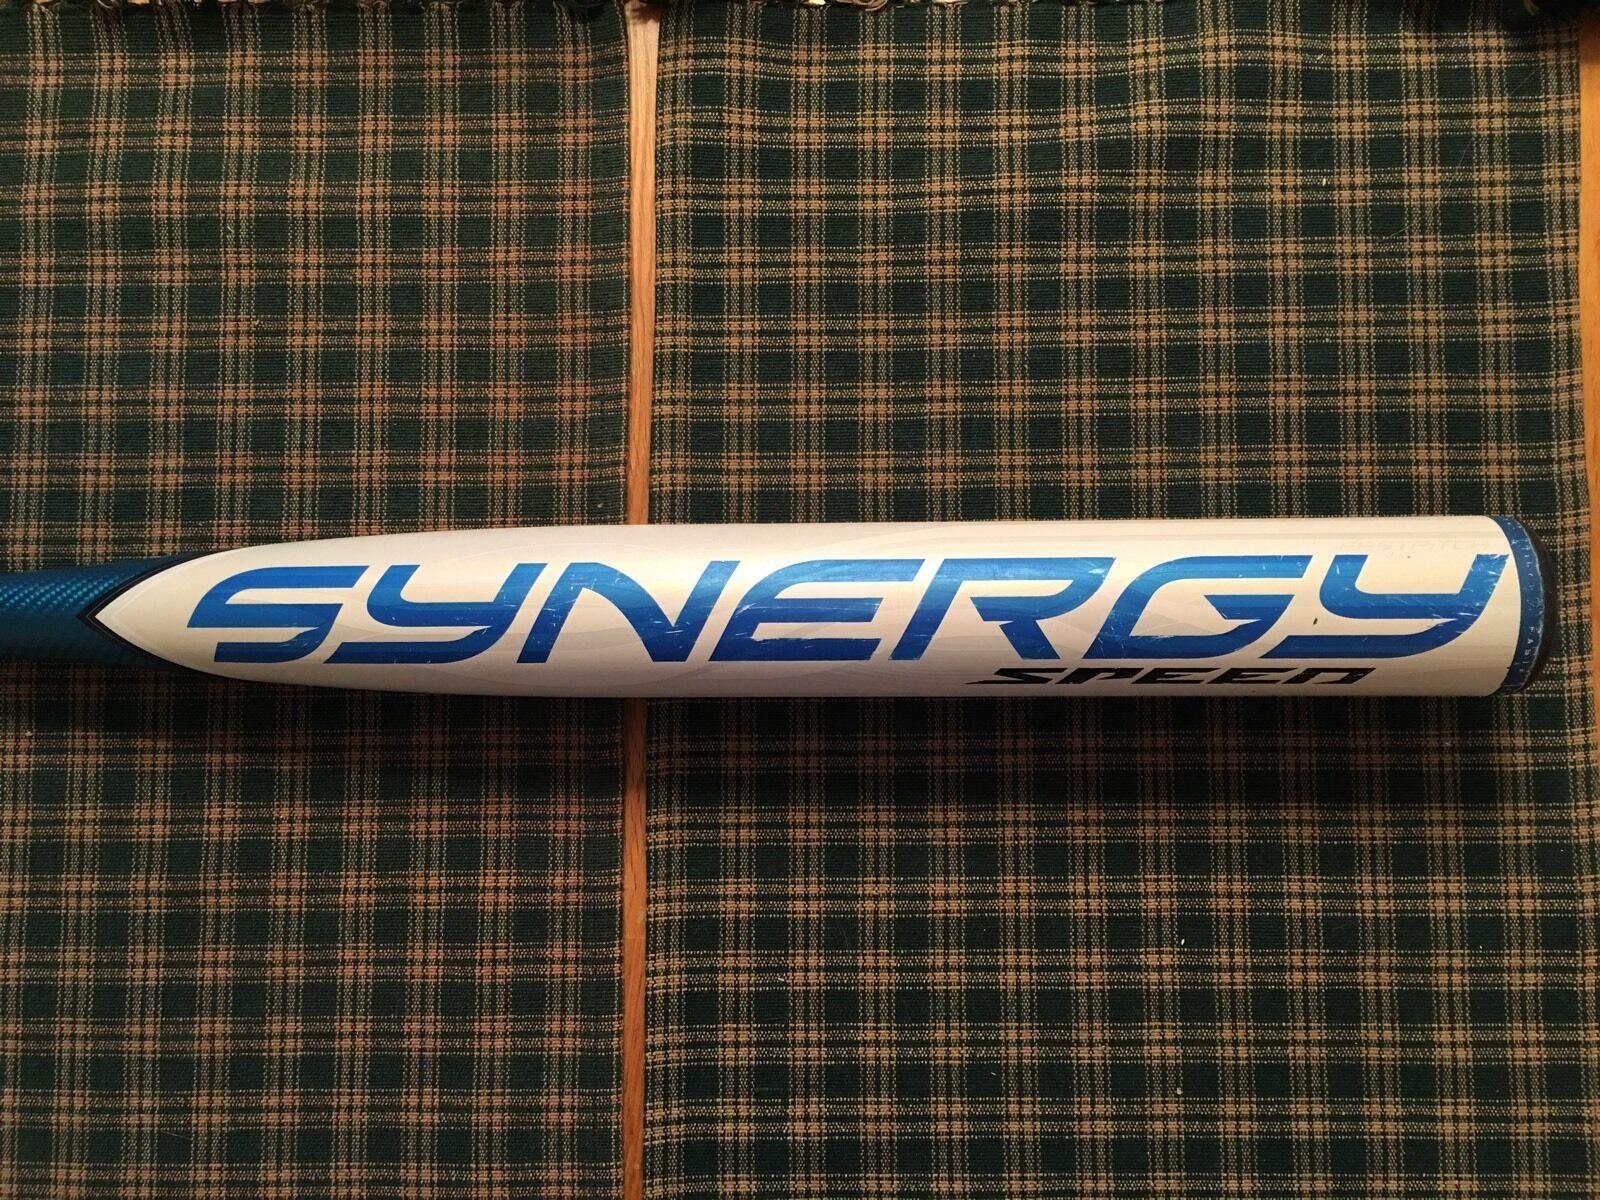 RARE USED Easton SYNERGY Speed SRV4B Fastpitch Softball Bat Bat Softball 33/23 (-10) ASA HOT dbf85c